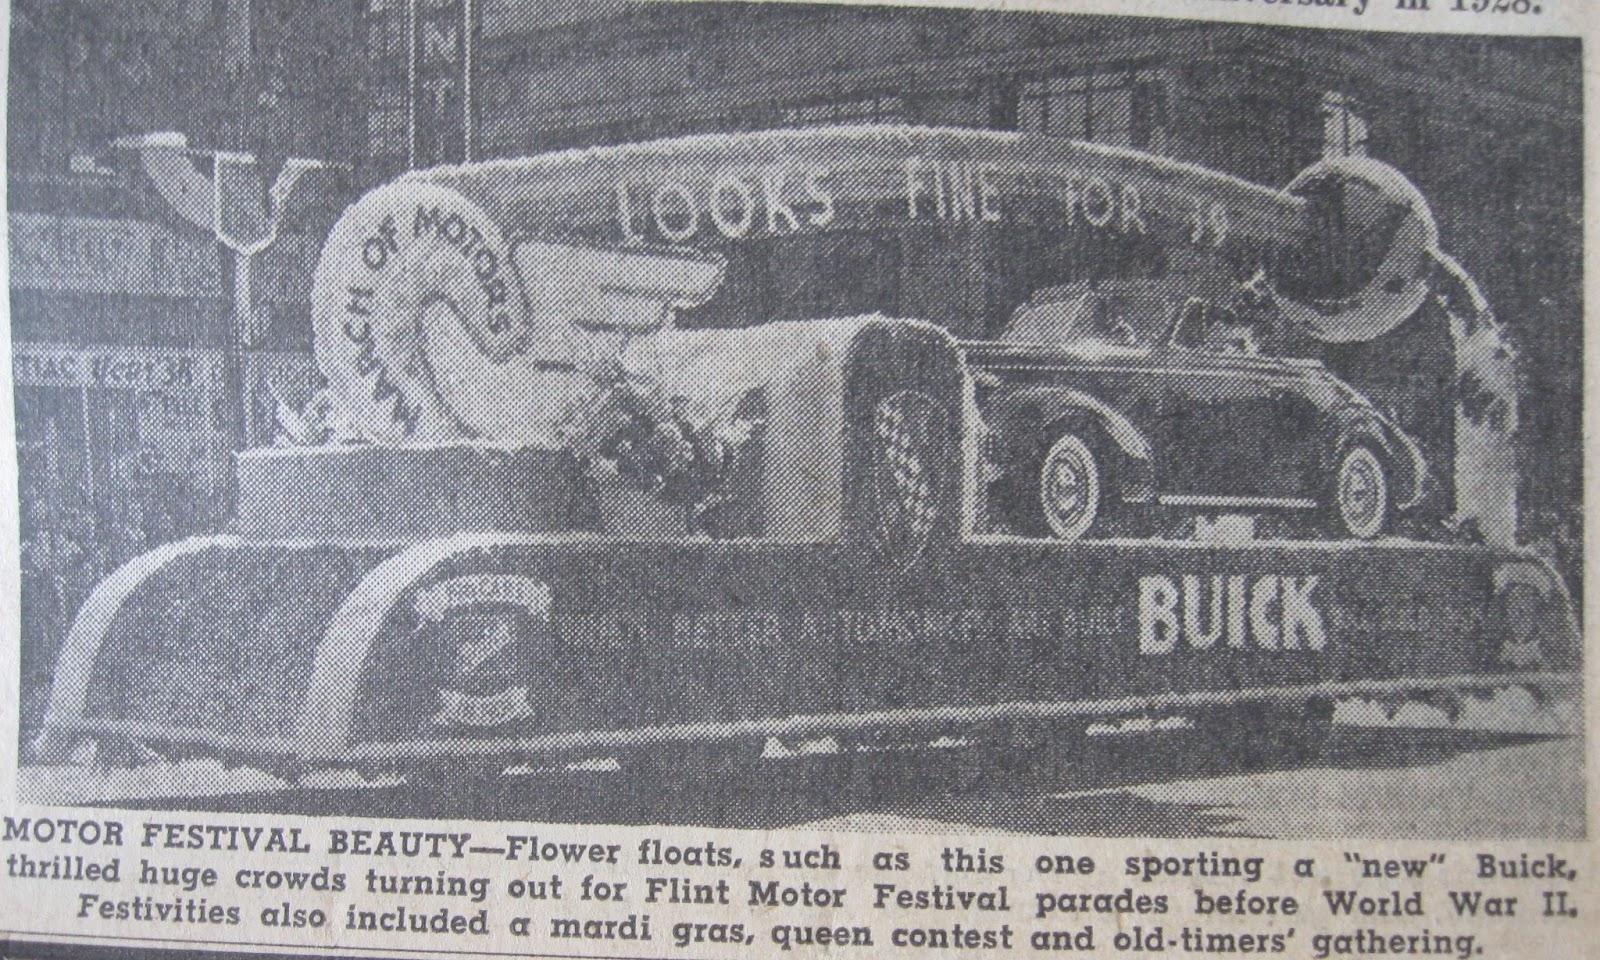 General Motors 50th Anniversary Buick Factory History